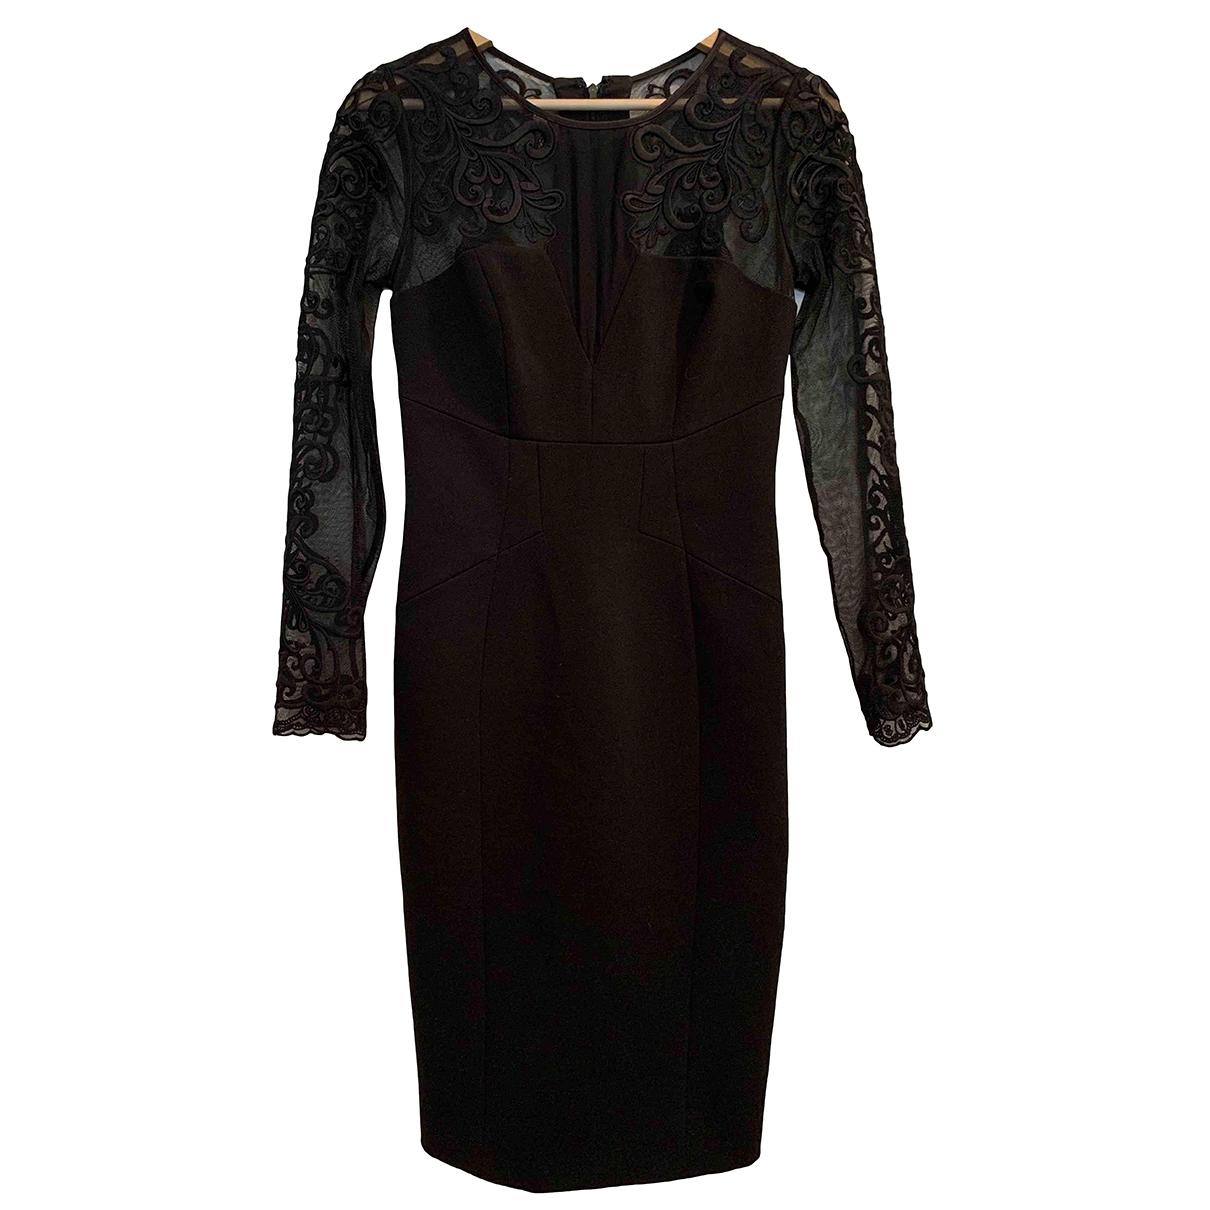 Karen Millen \N Black dress for Women 10 UK